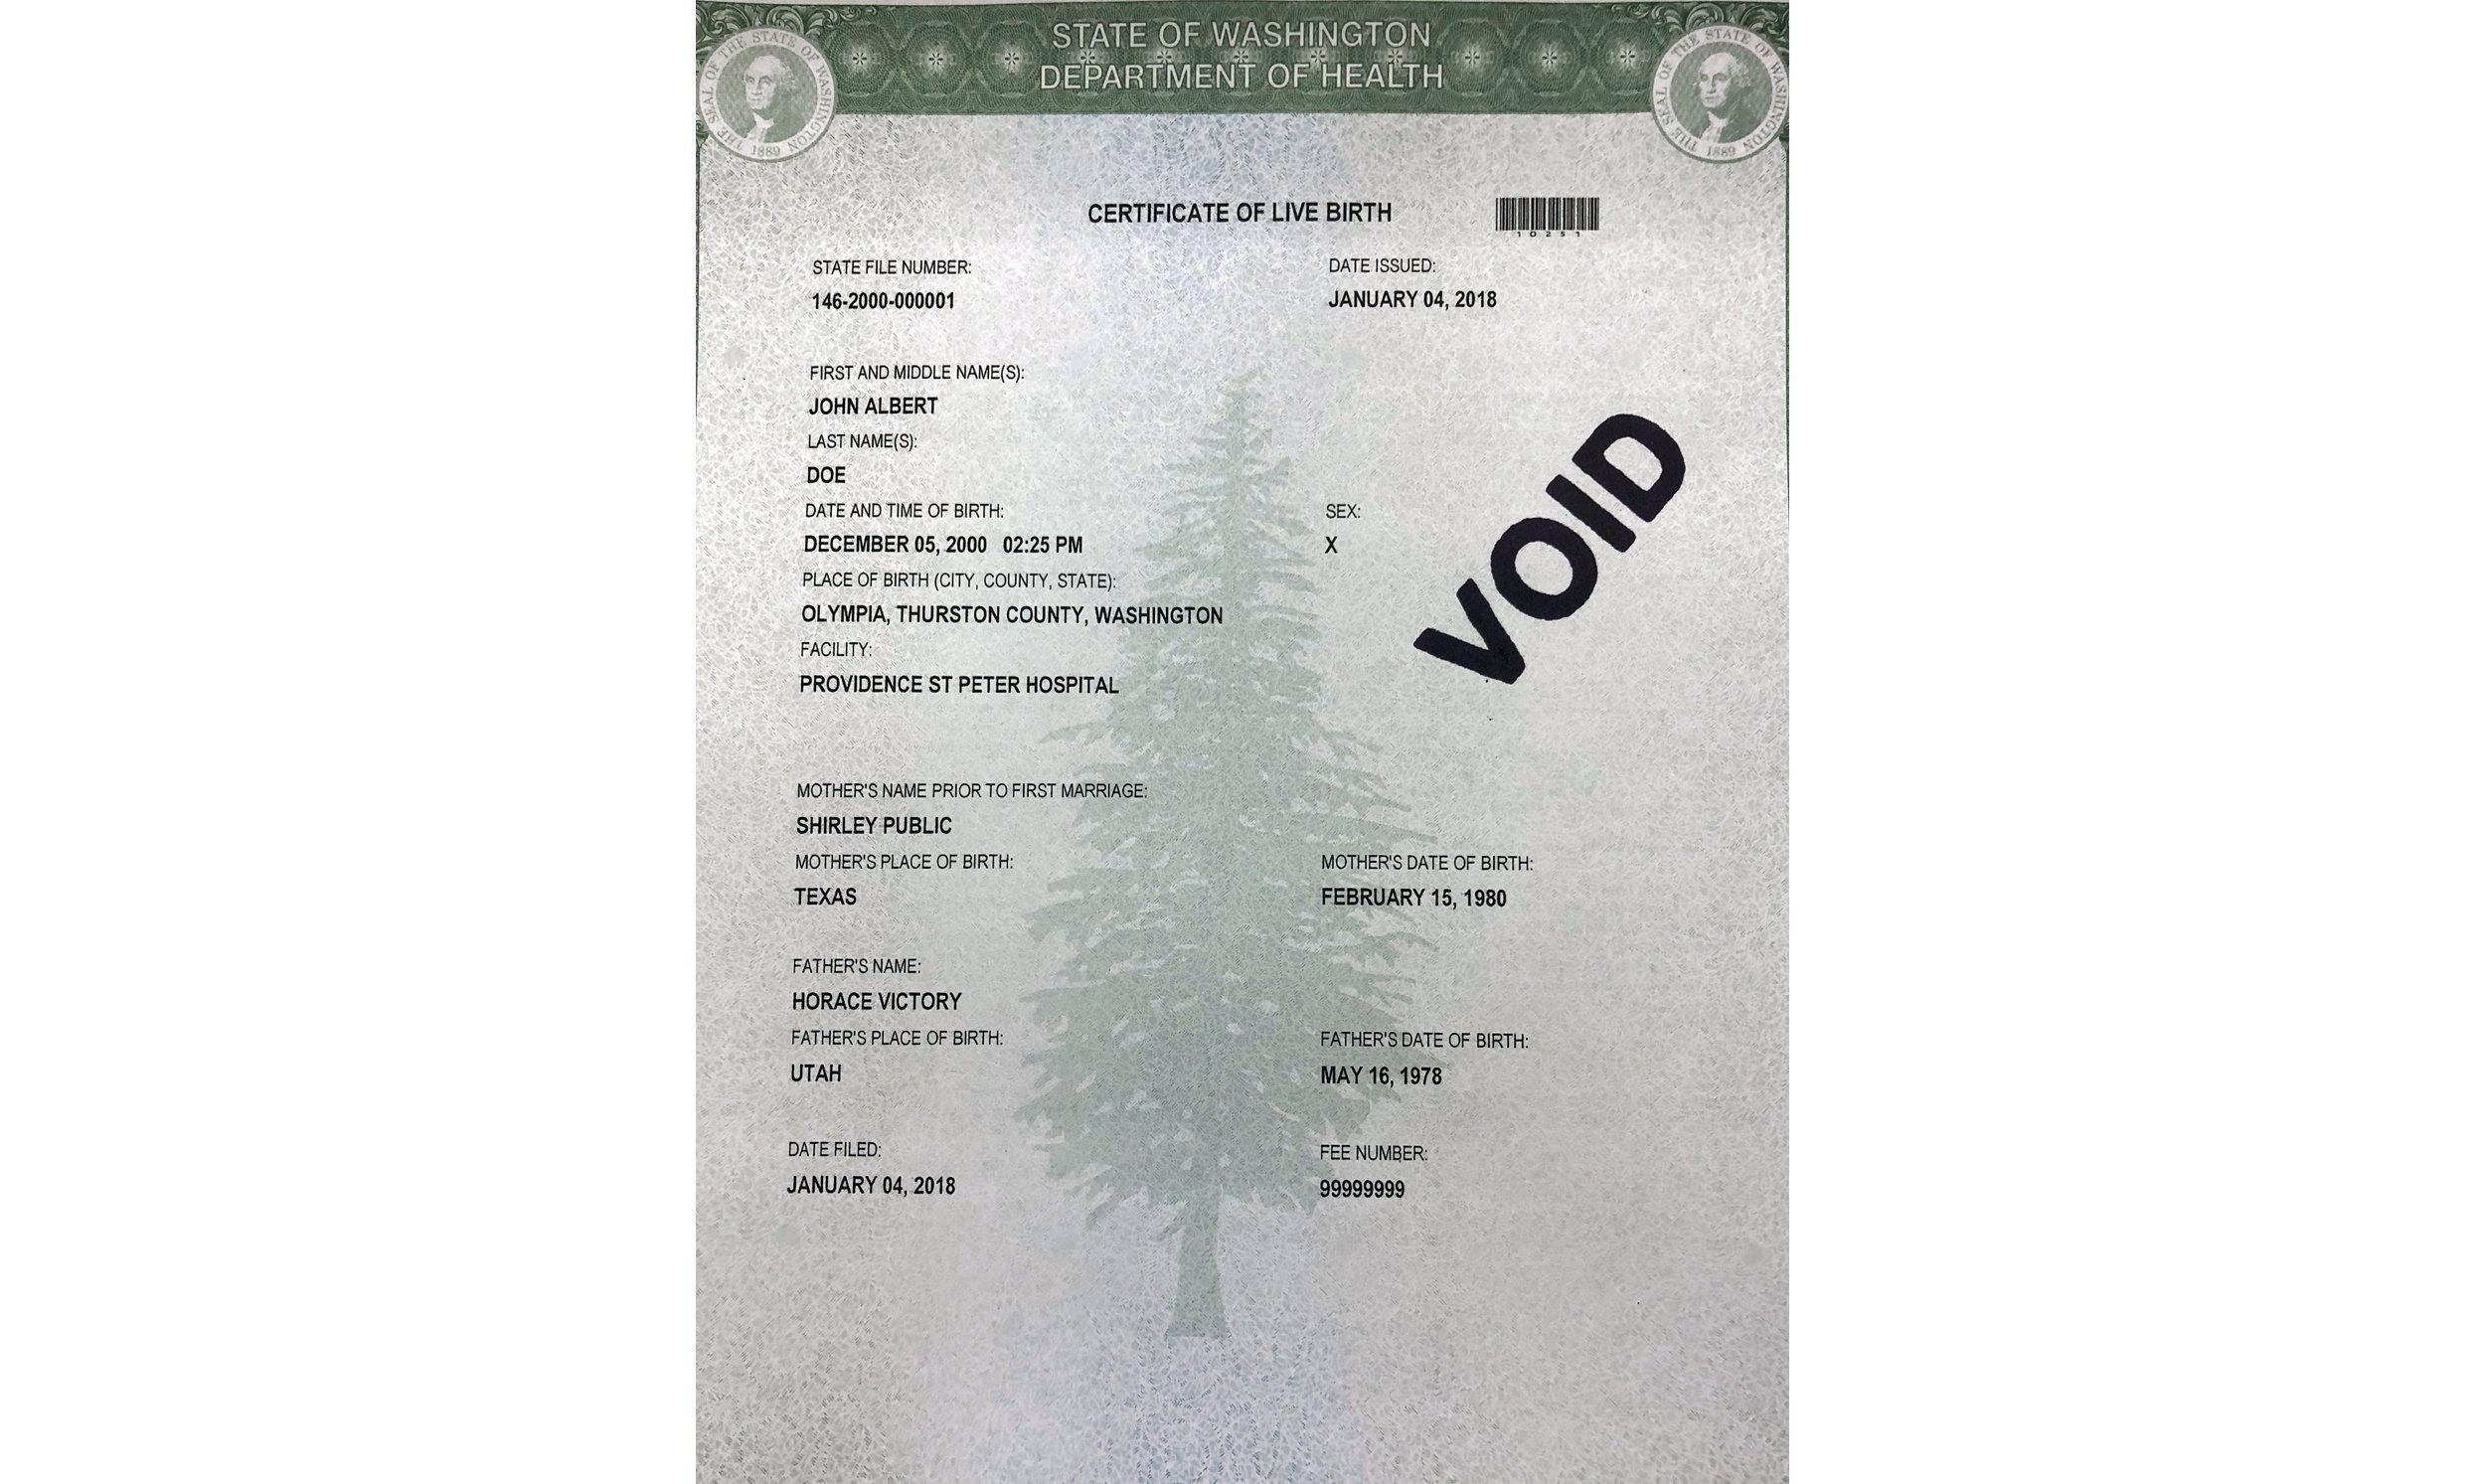 Washington state offers third gender option on birth certificate ...